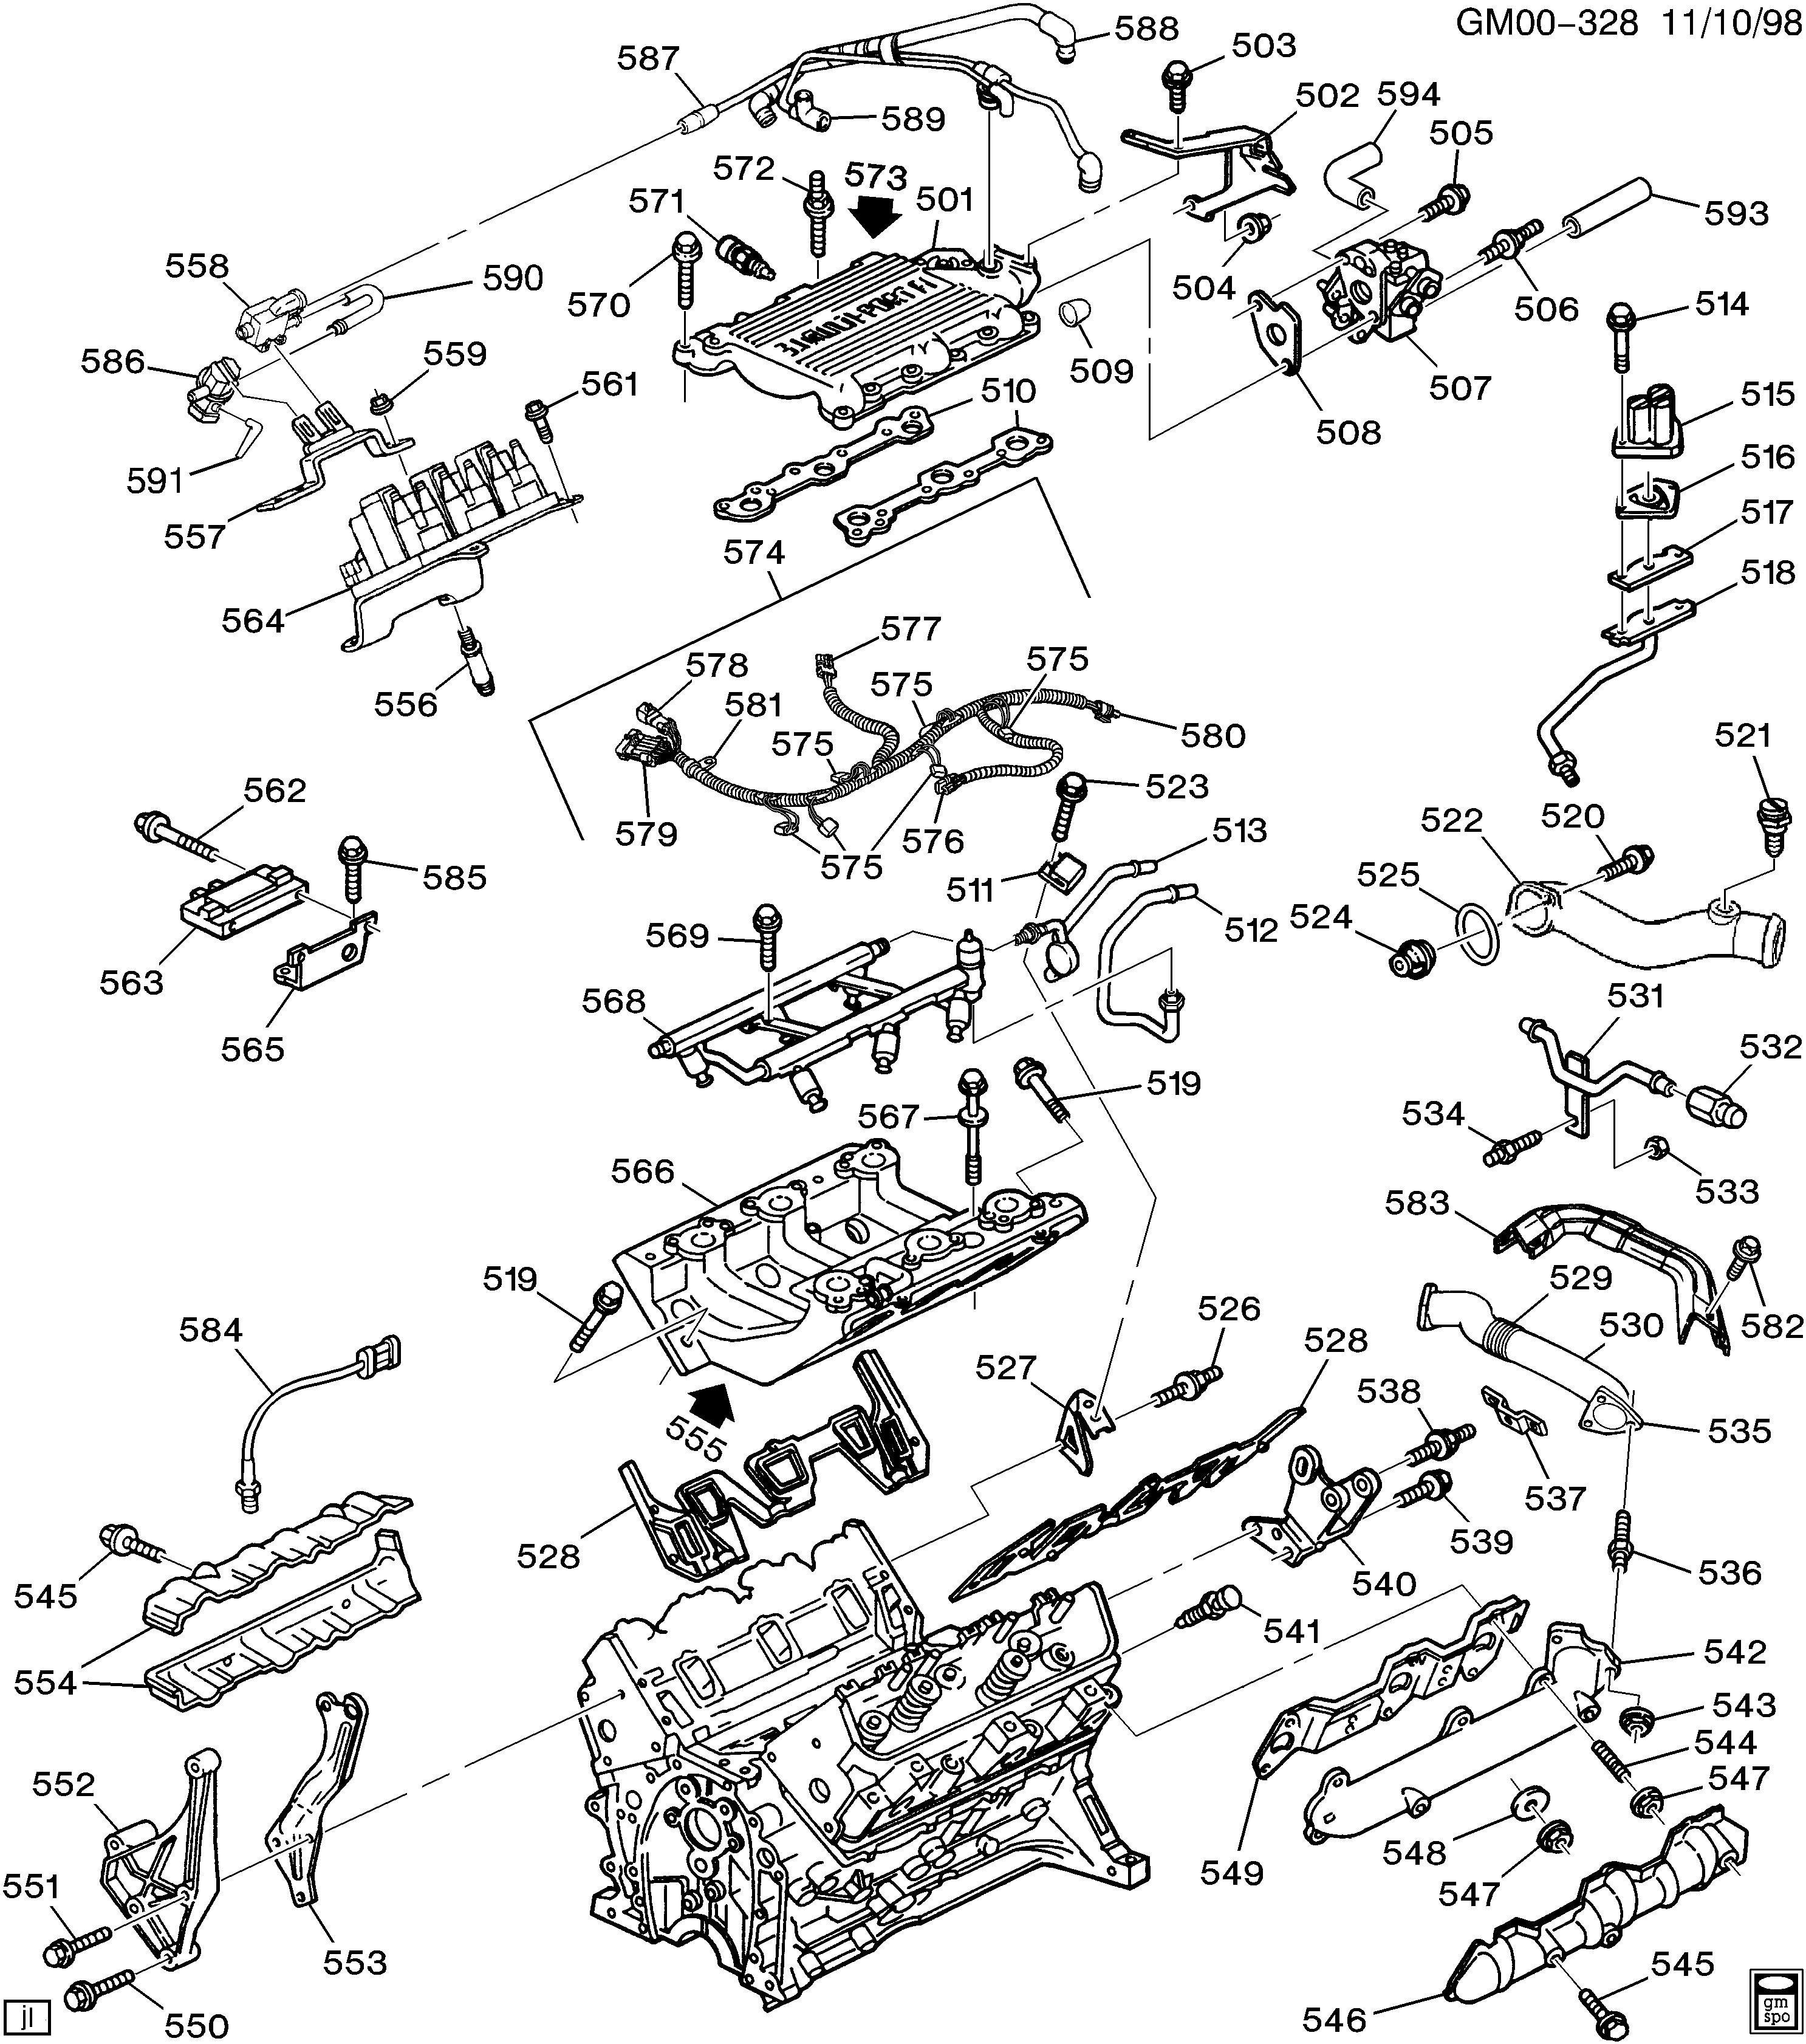 chevy 3 1 engine diagram - wiring diagram base central -  central.jabstudio.it  jab studio